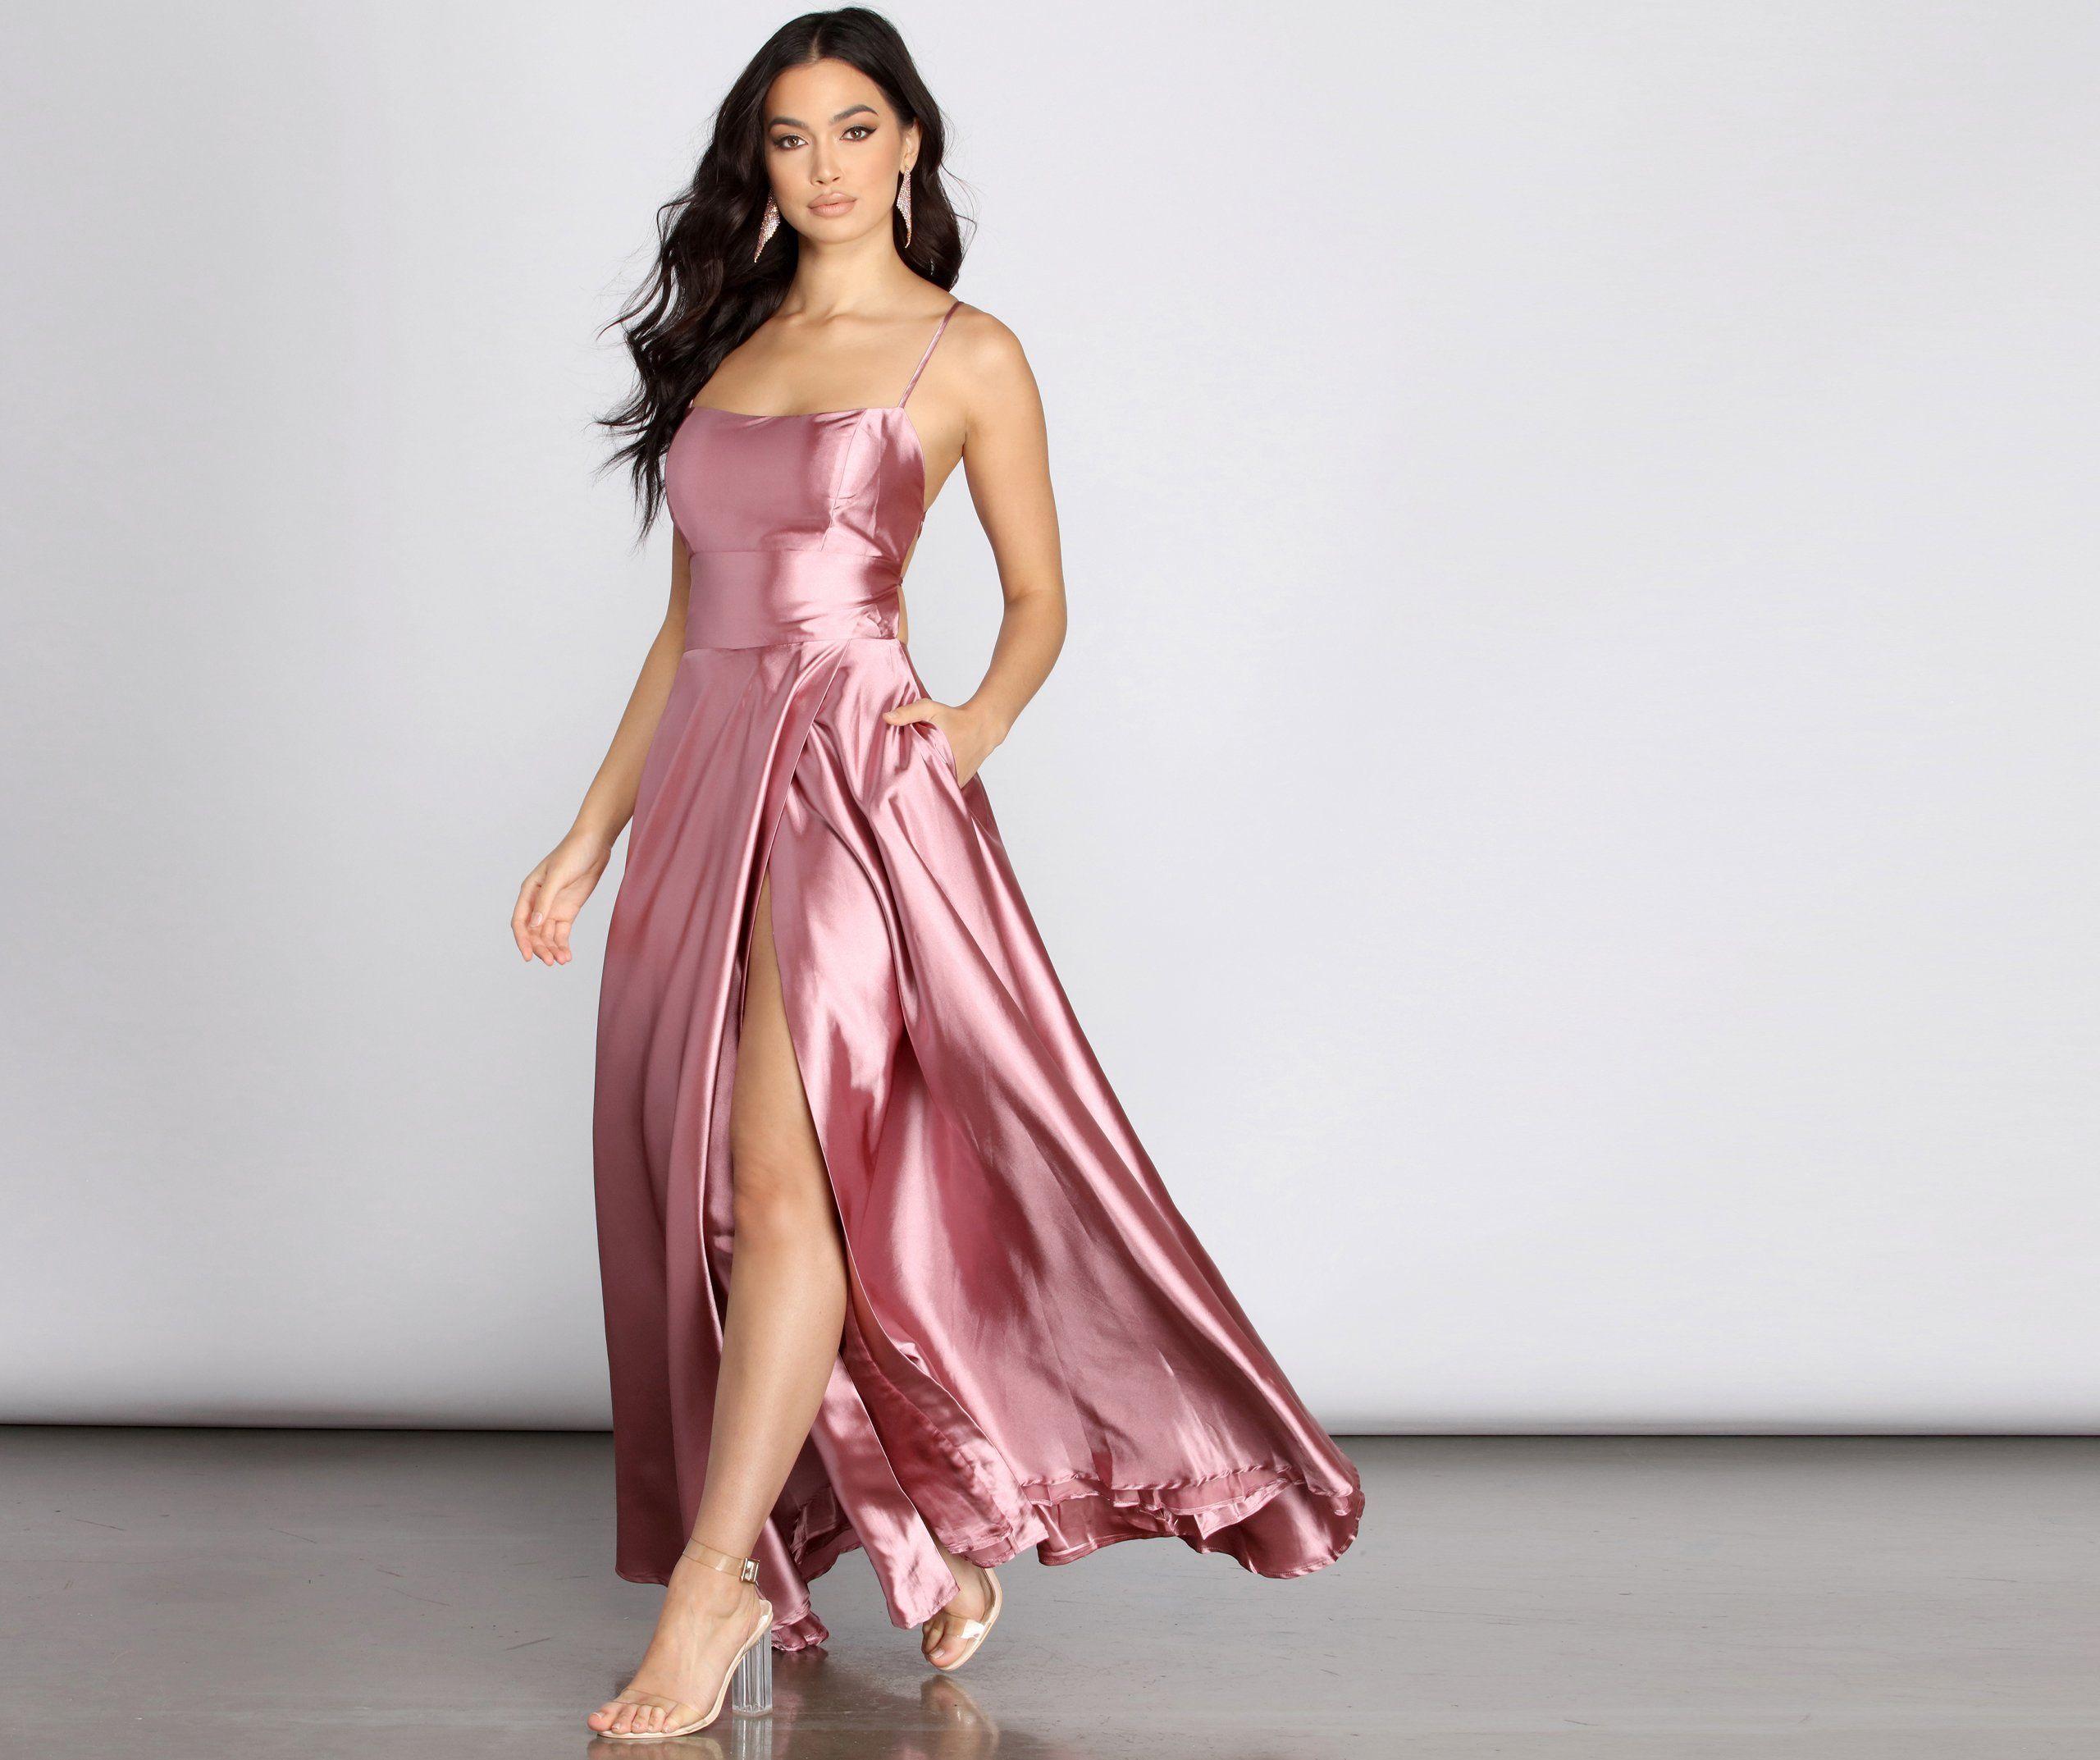 Anne Formal Lattice Satin Dress Dresses Satin Dresses Windsor Dresses Prom [ 2145 x 2560 Pixel ]